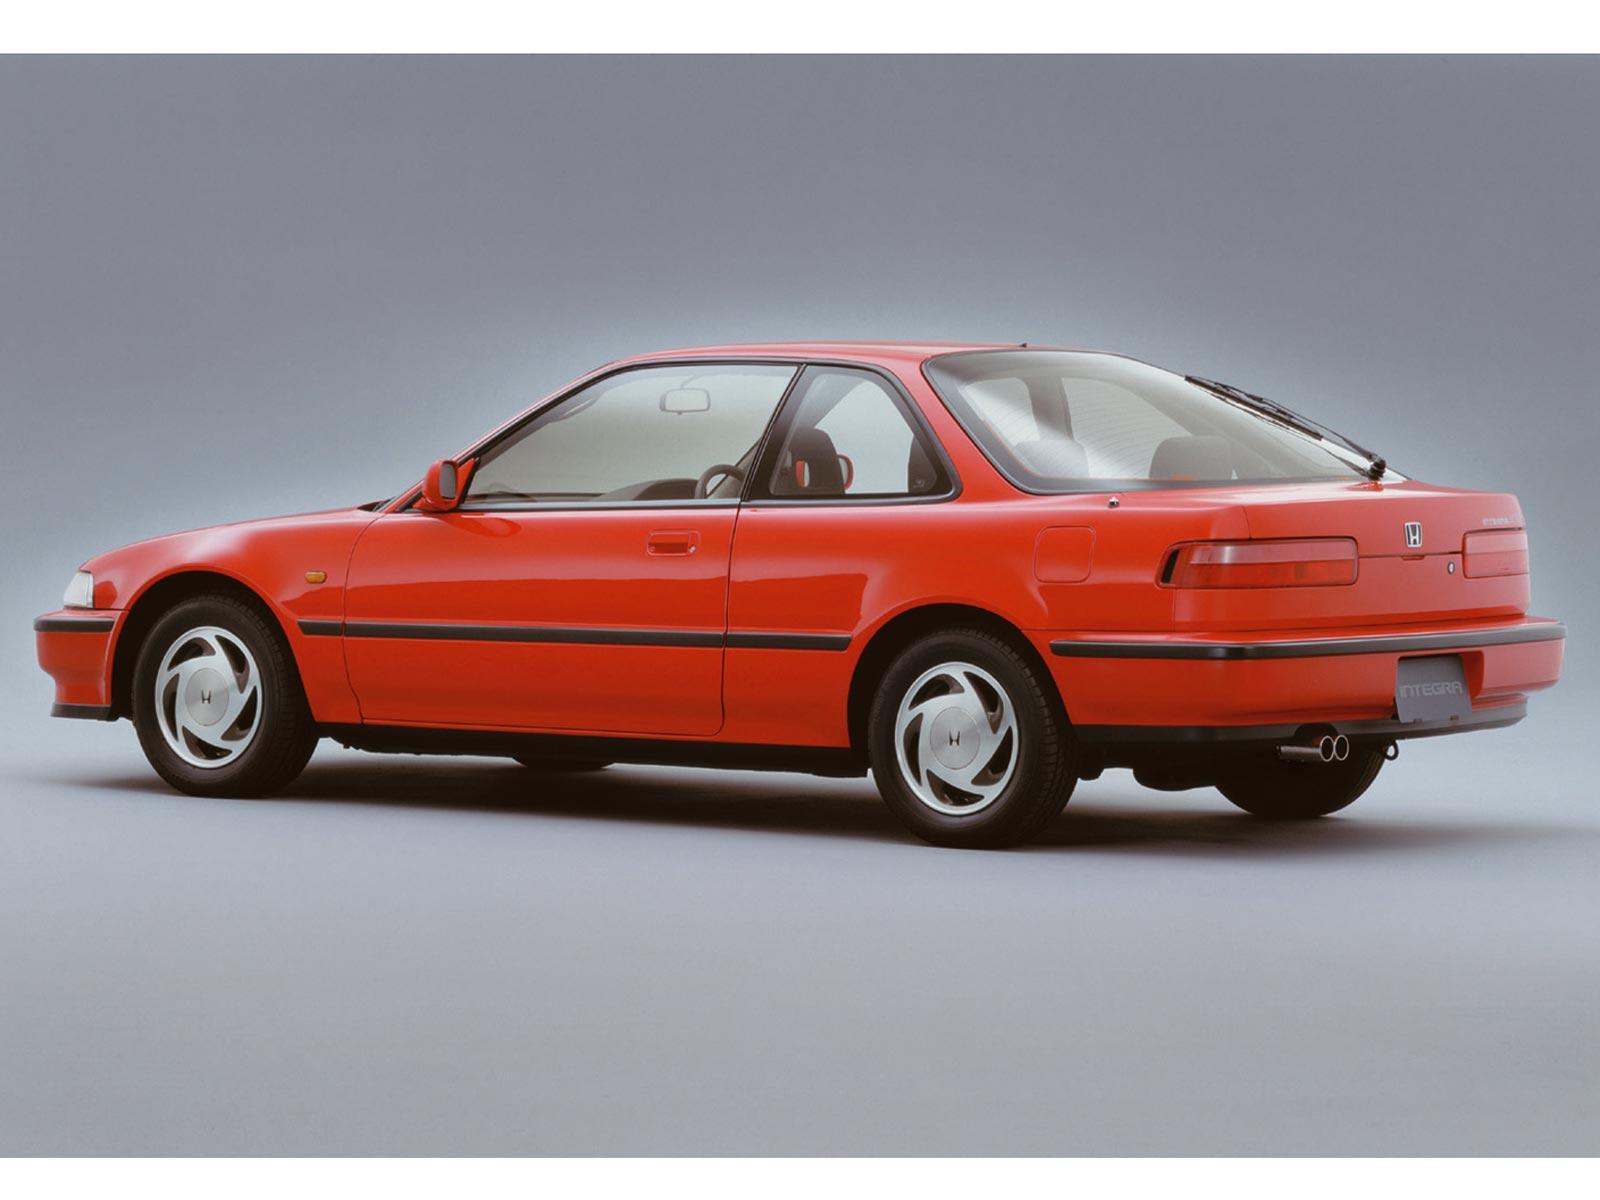 Honda Integra I 1985 - 1989 Sedan #4